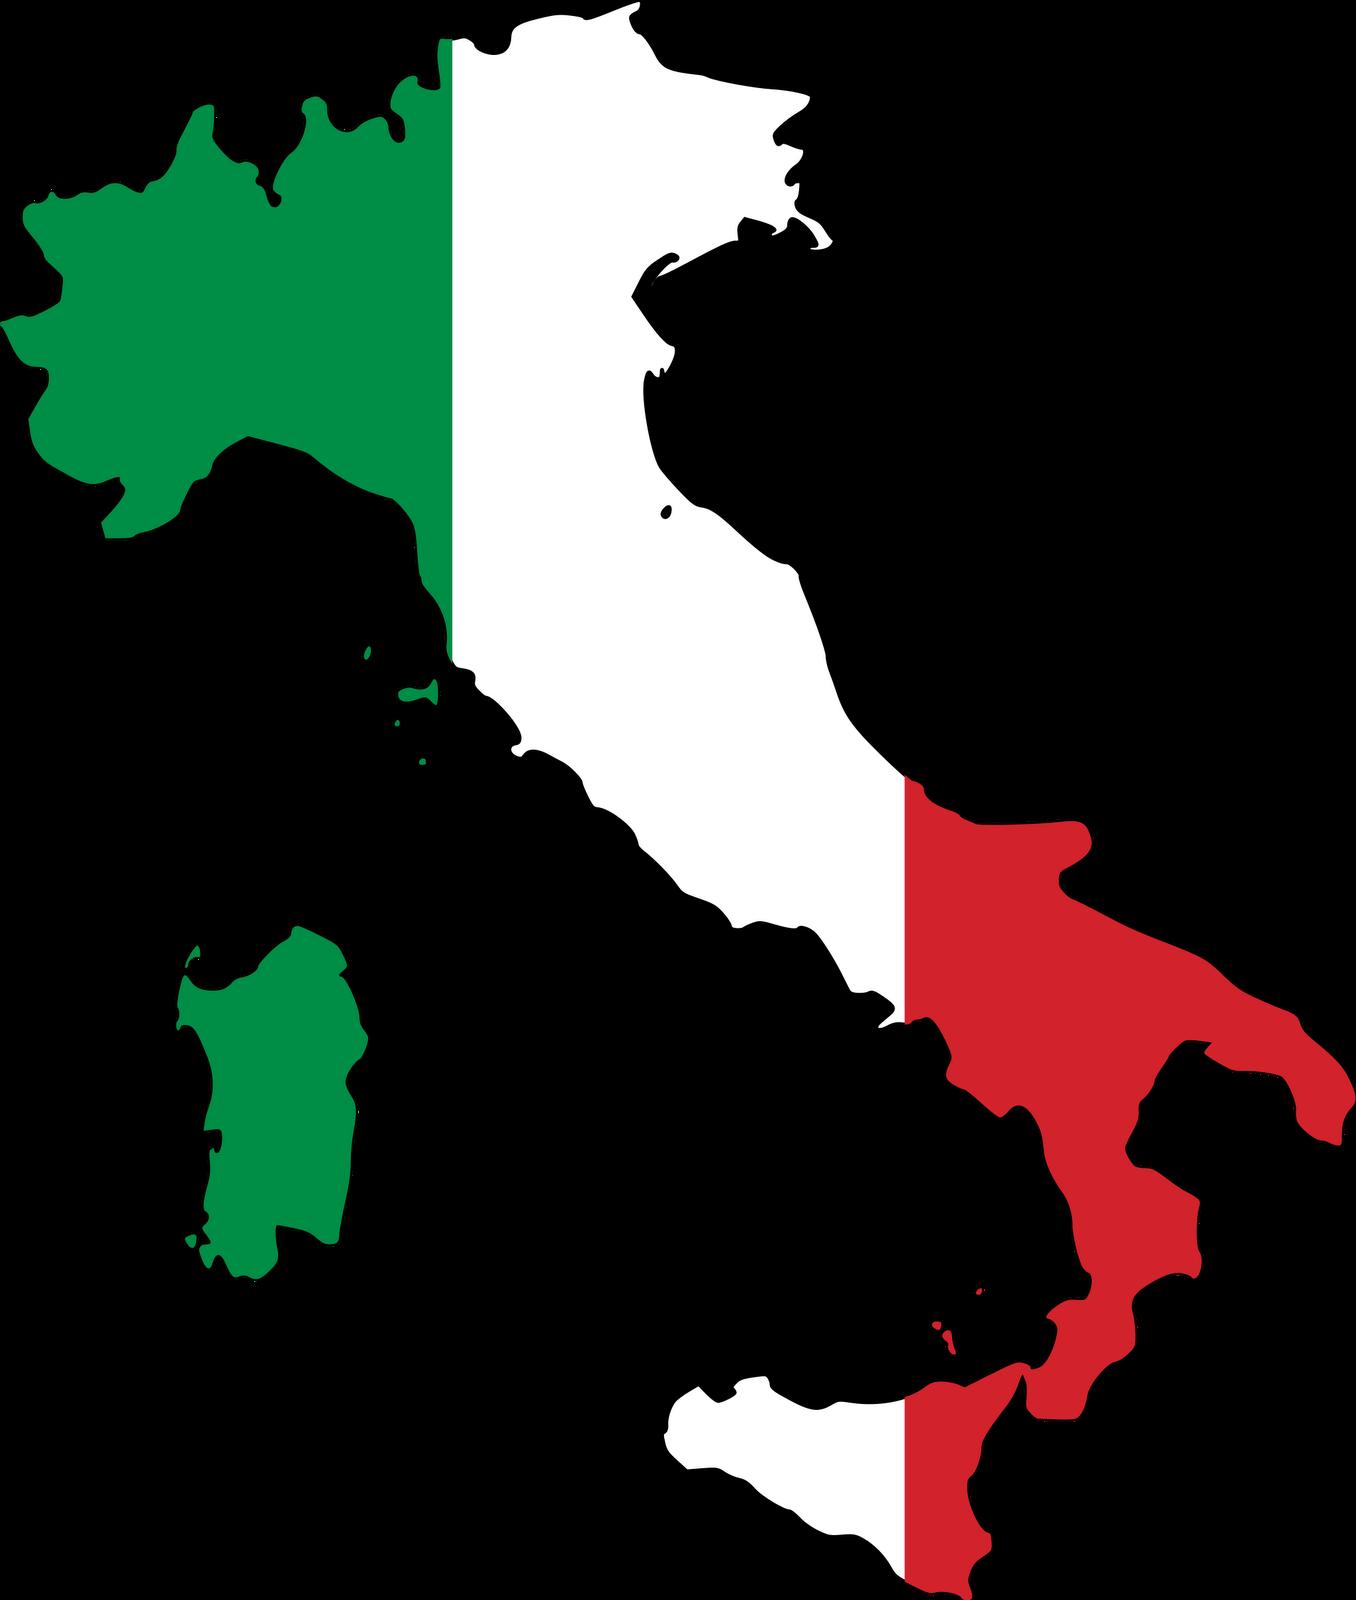 Italy clipart flag italian. Clip art map